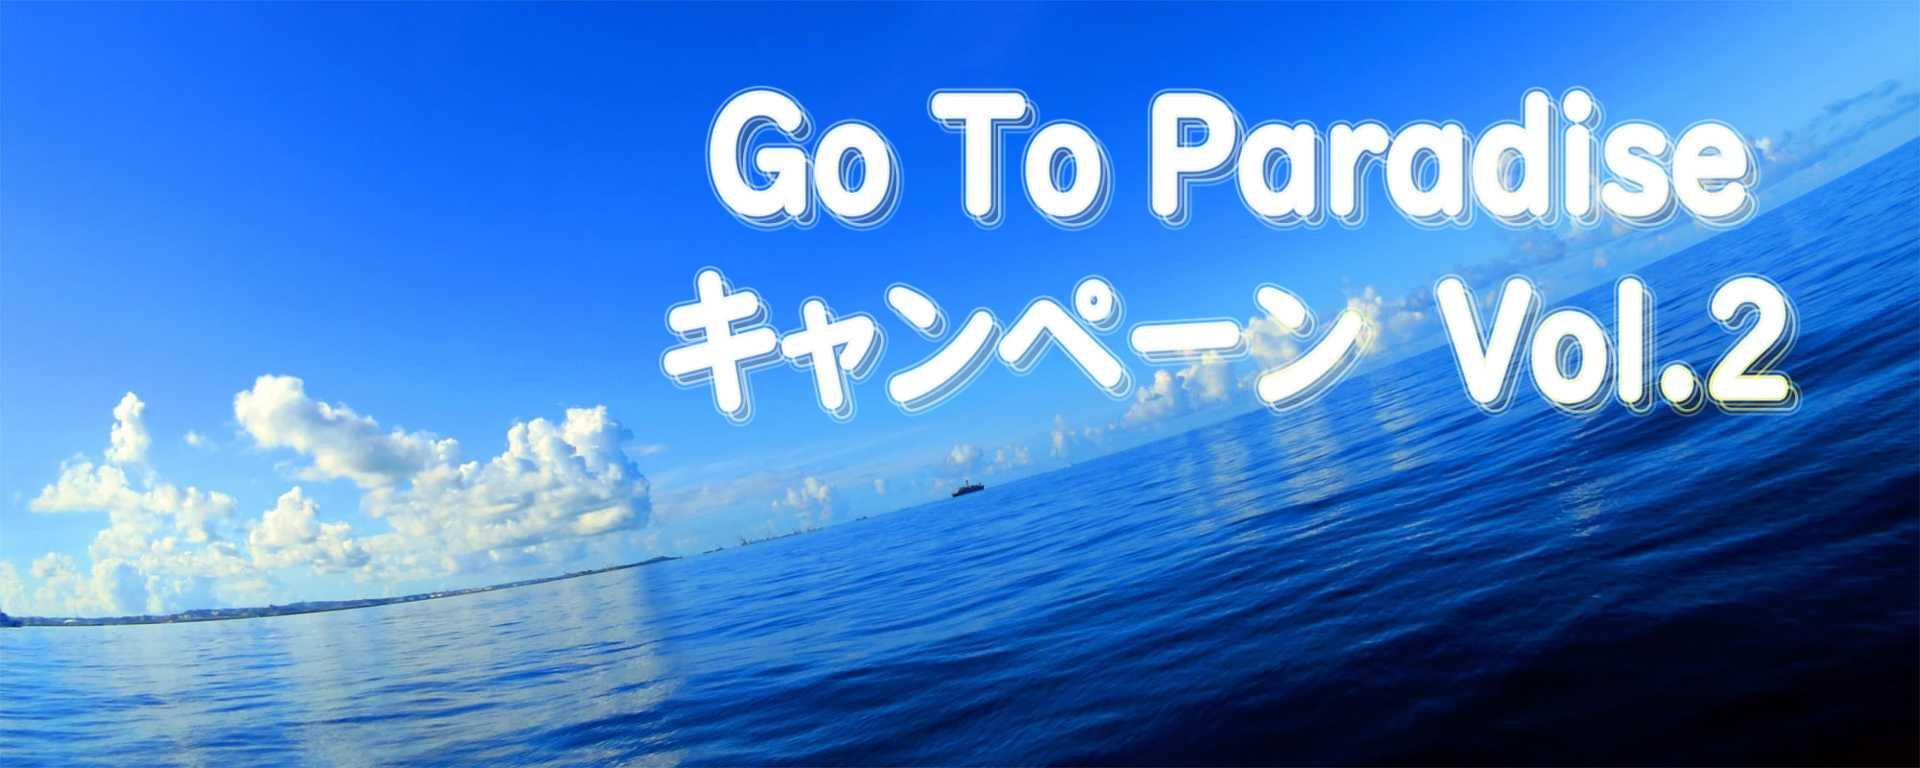 Go To Paradise キャンペーン Vol.2